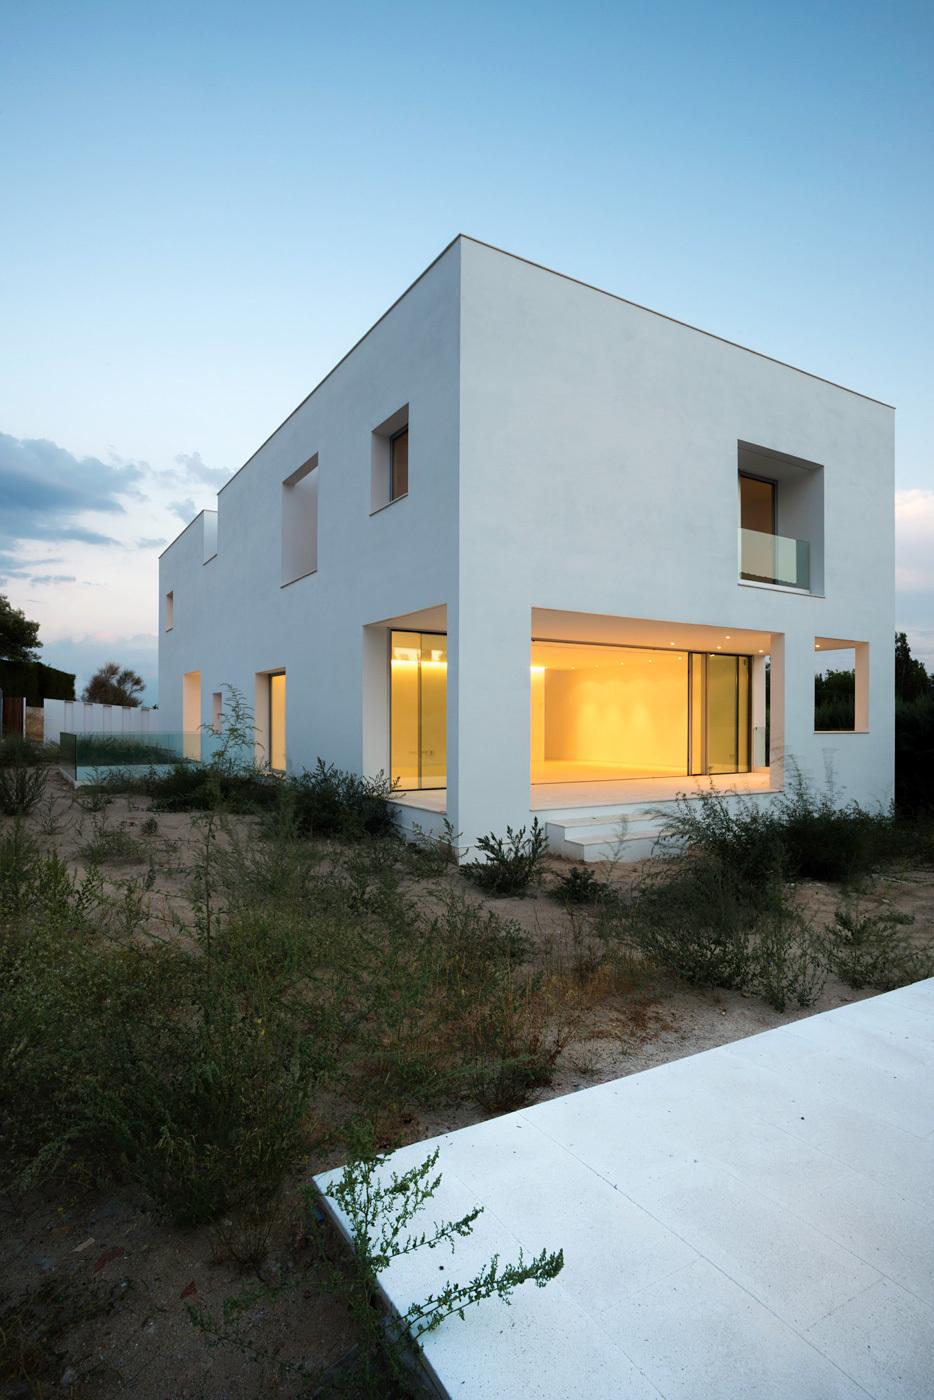 Casa H in Madrid, Spain by Bojaus Arquitectura. Image credit: Joaquín Mosquera.